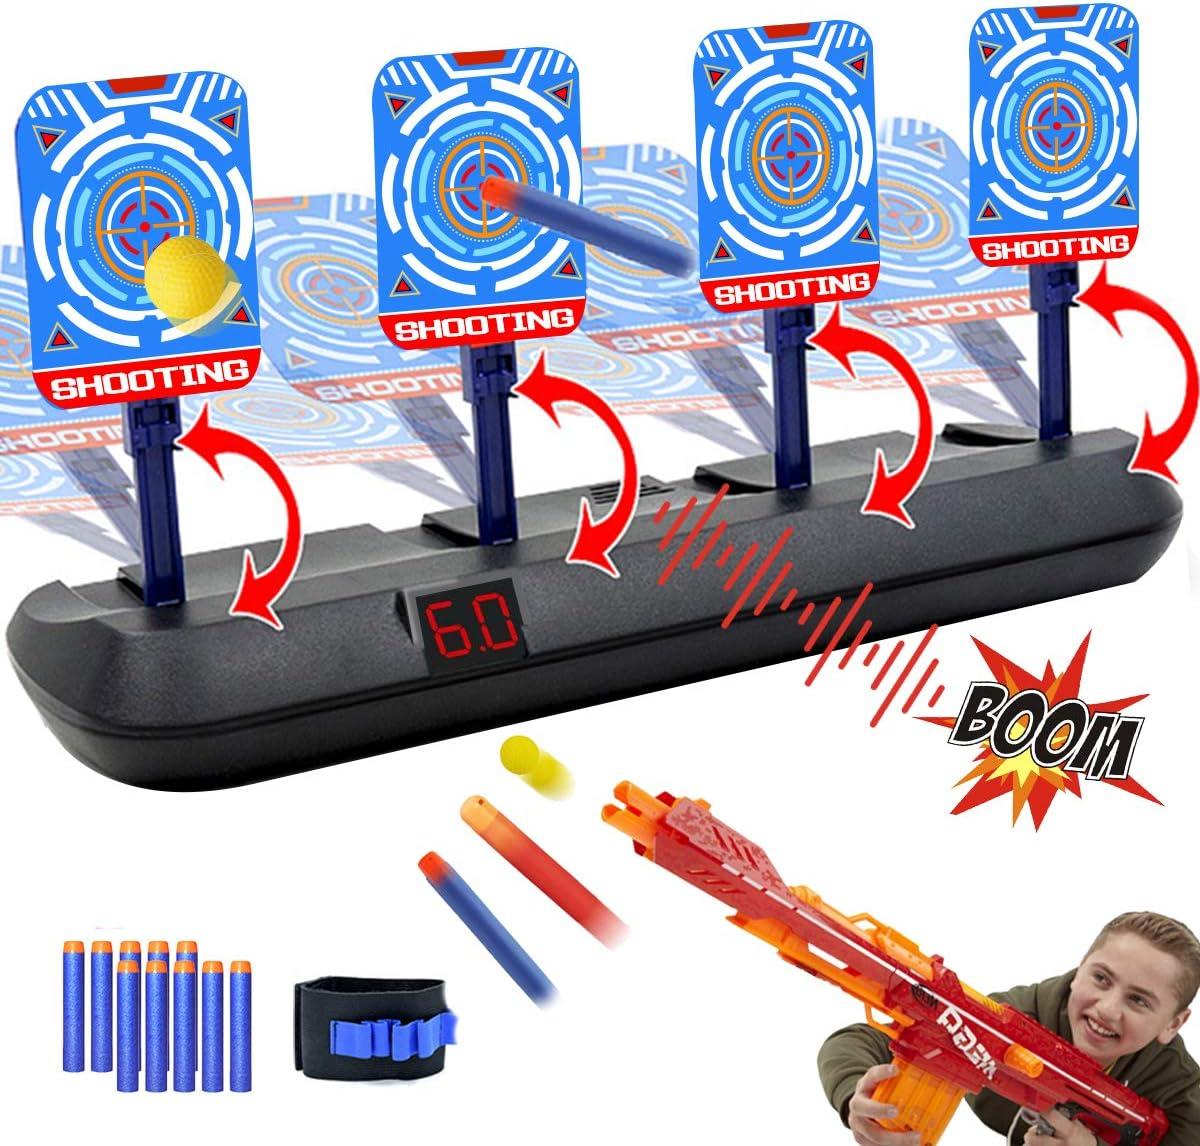 Target Fortnite Nerf Guns Amazon Com Electronic Shooting Target For Nerf Guns Auto Reset Digital Scoring Shooting Practice Targets Ideal Gifts Toys For Kids Teens Boys Girls 2021 Update Version 4 Targets Toys Games